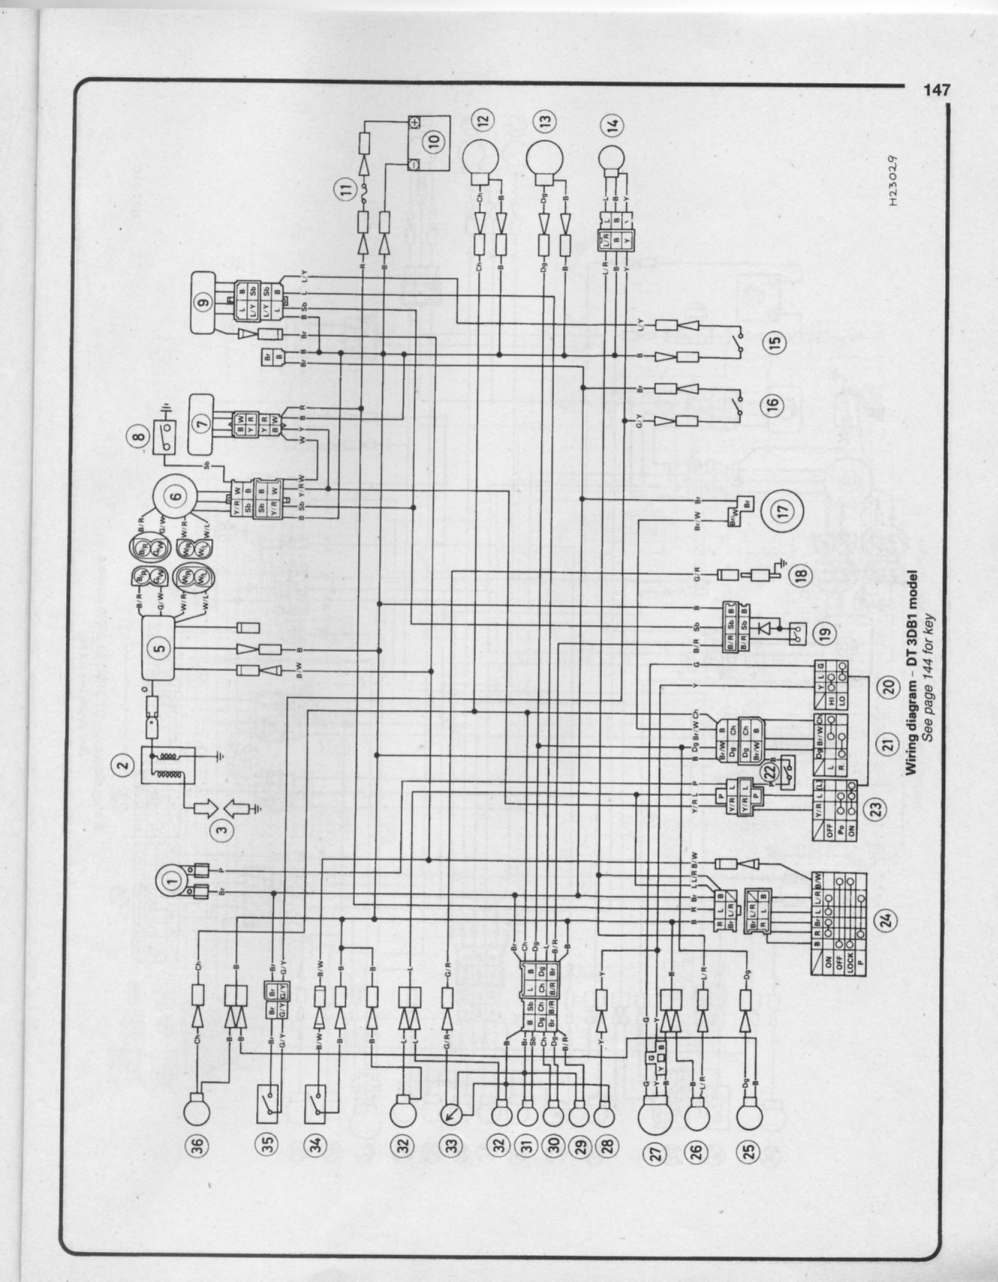 Yamaha Xt 350 Wiring Diagram Auto Electrical Dt 125 X